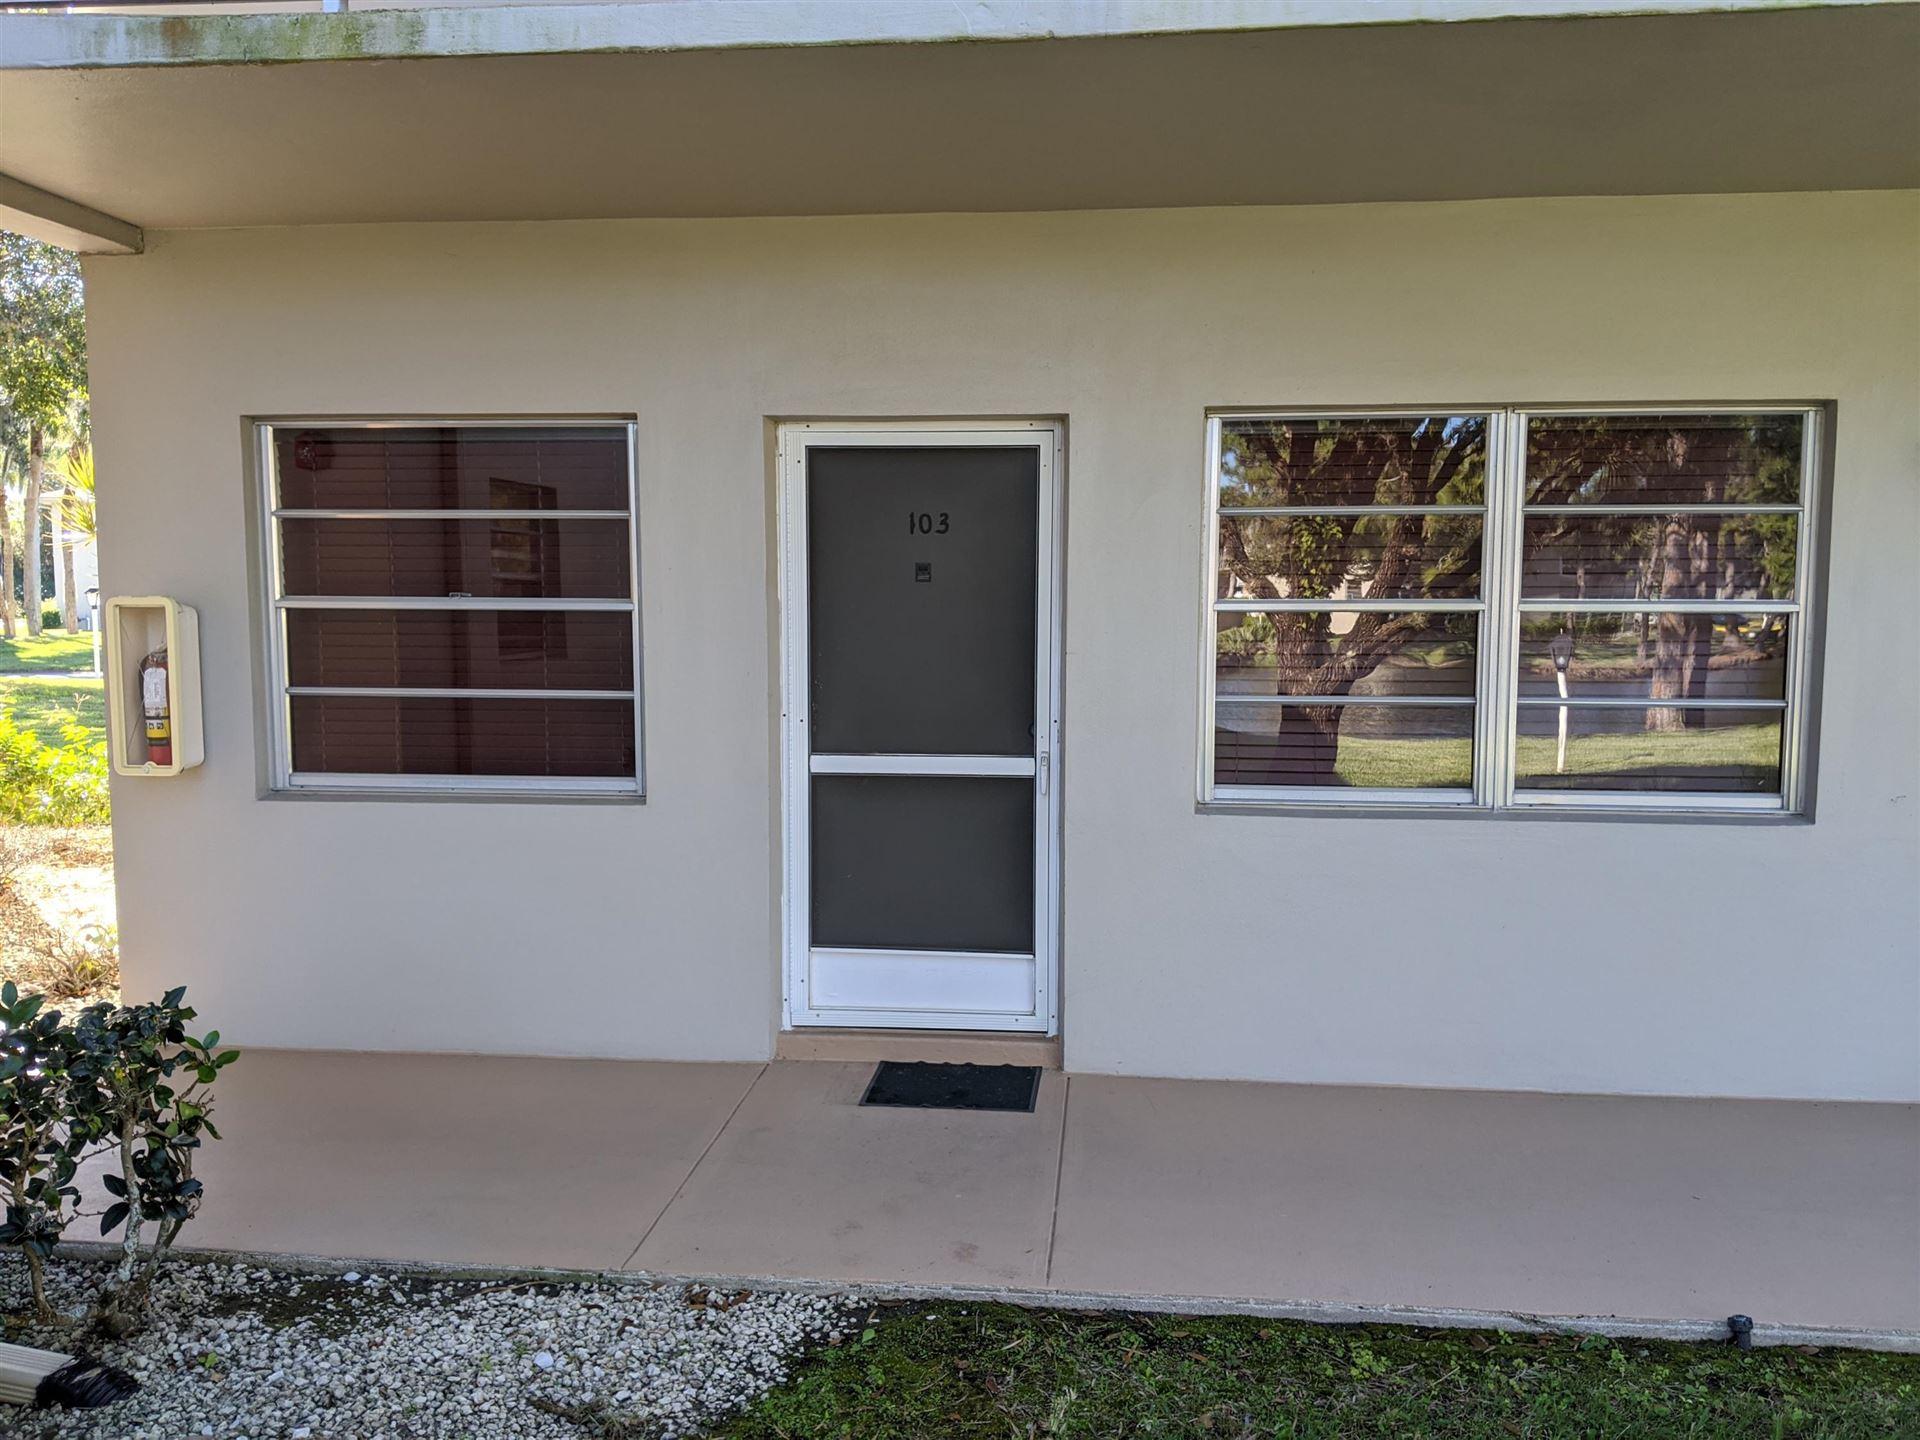 5 Lake Vista Trail #103, Port Saint Lucie, FL 34952 - #: RX-10617636